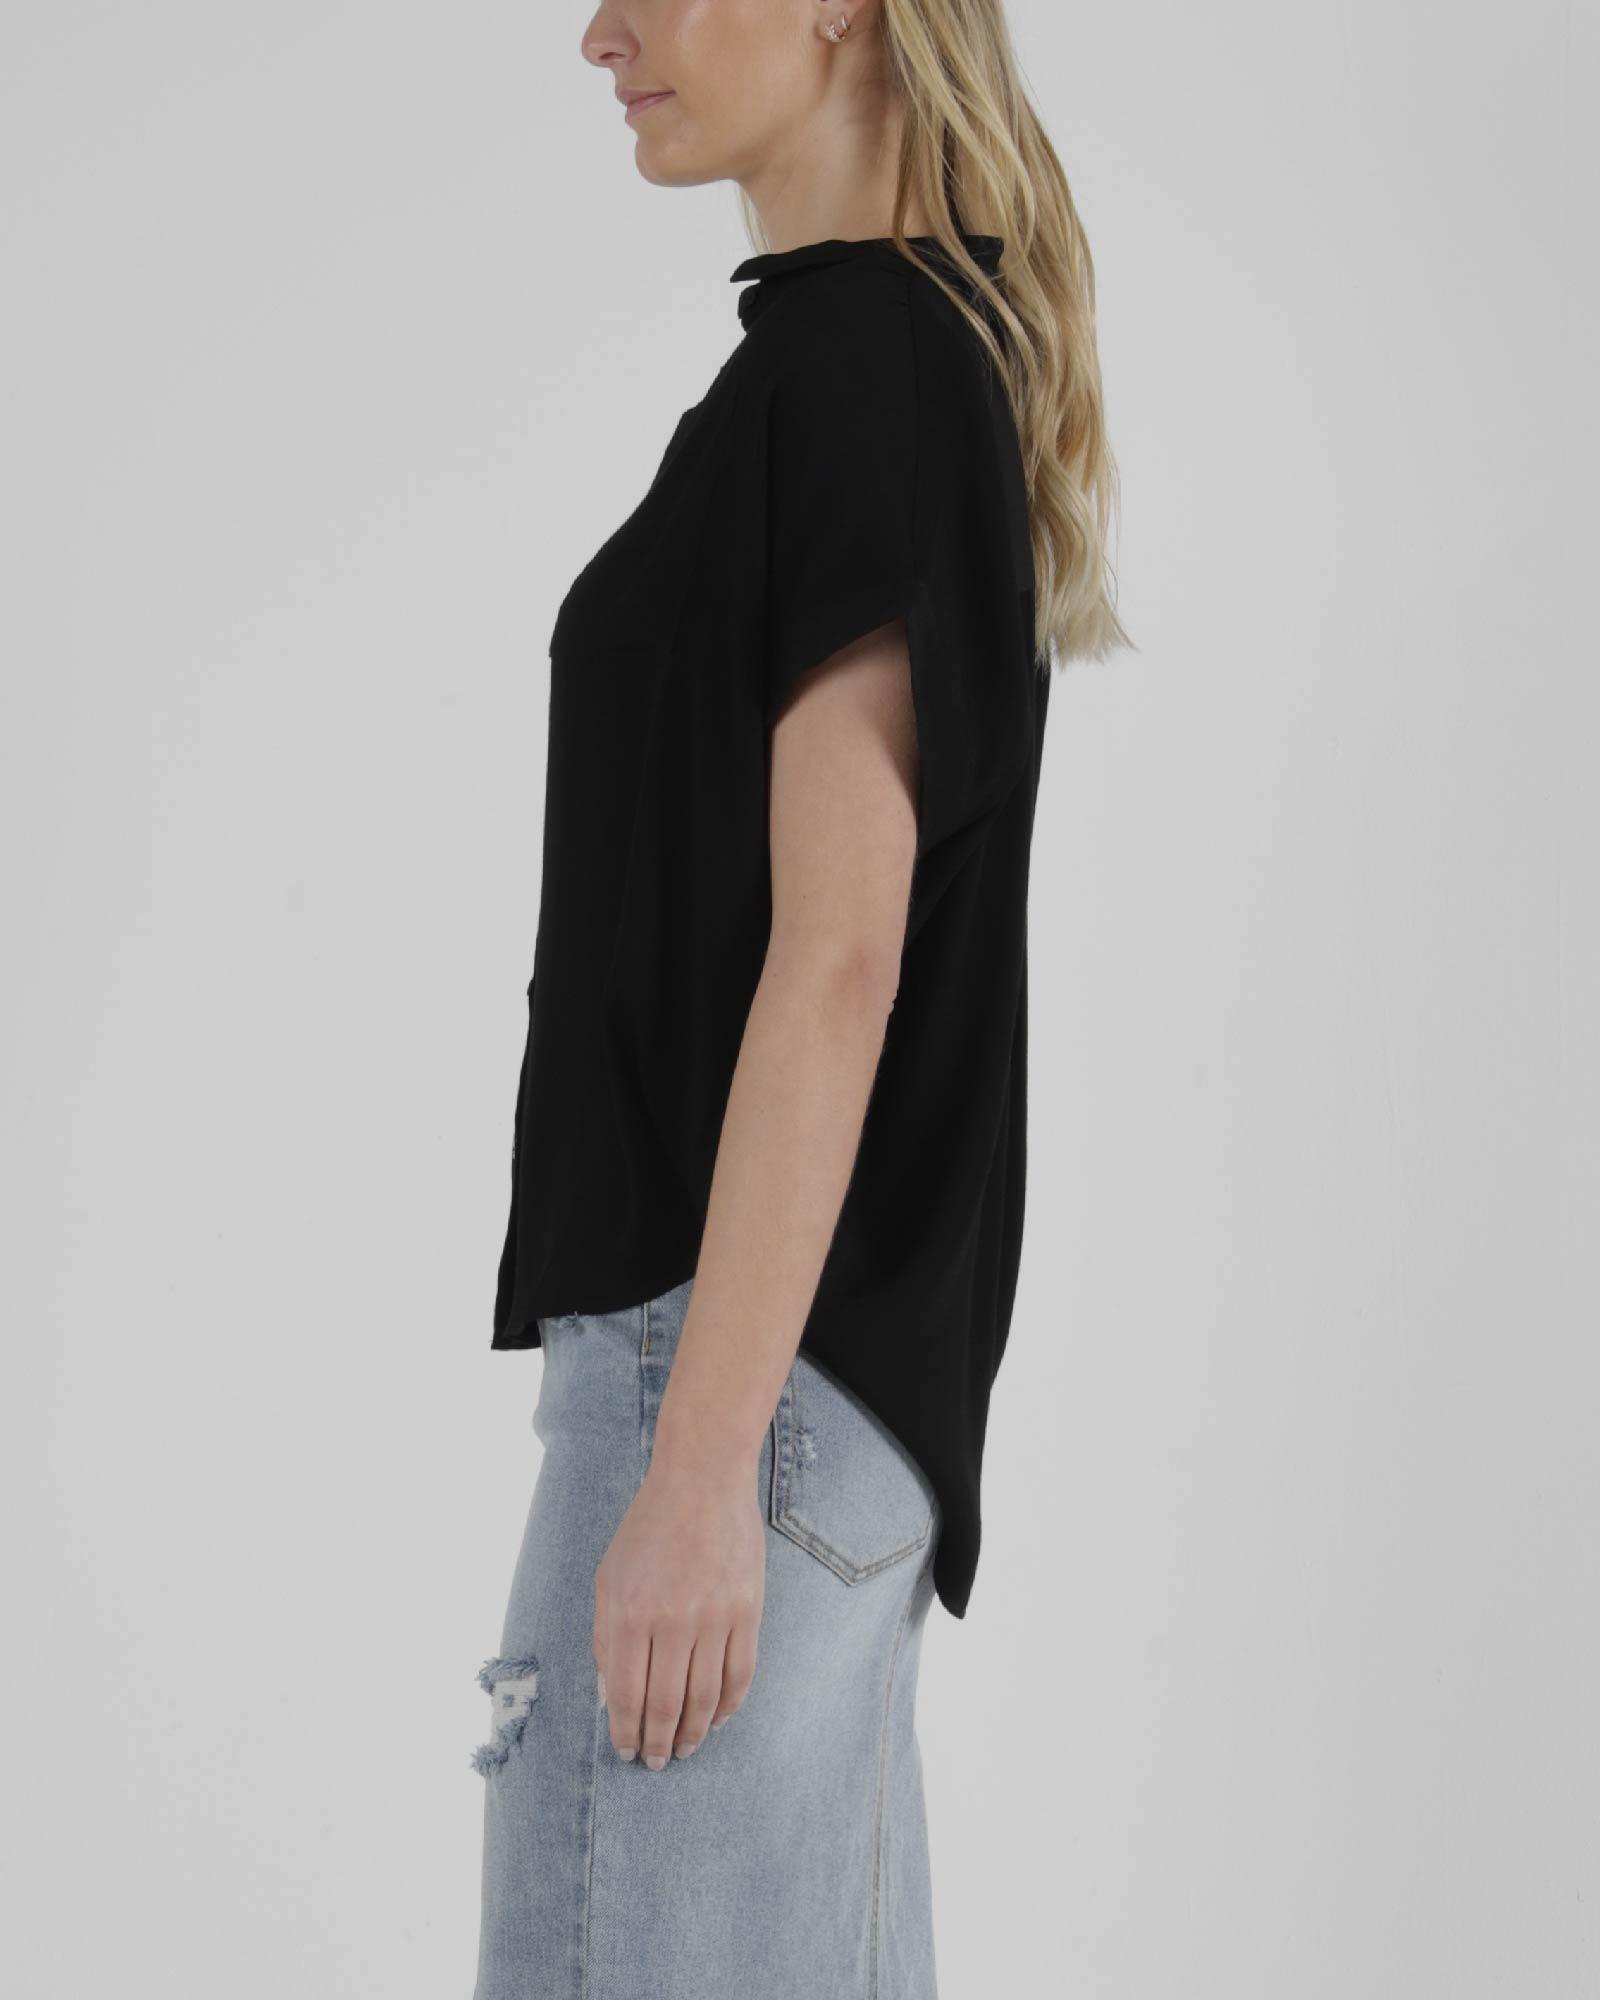 Sass Camille Shirt Black